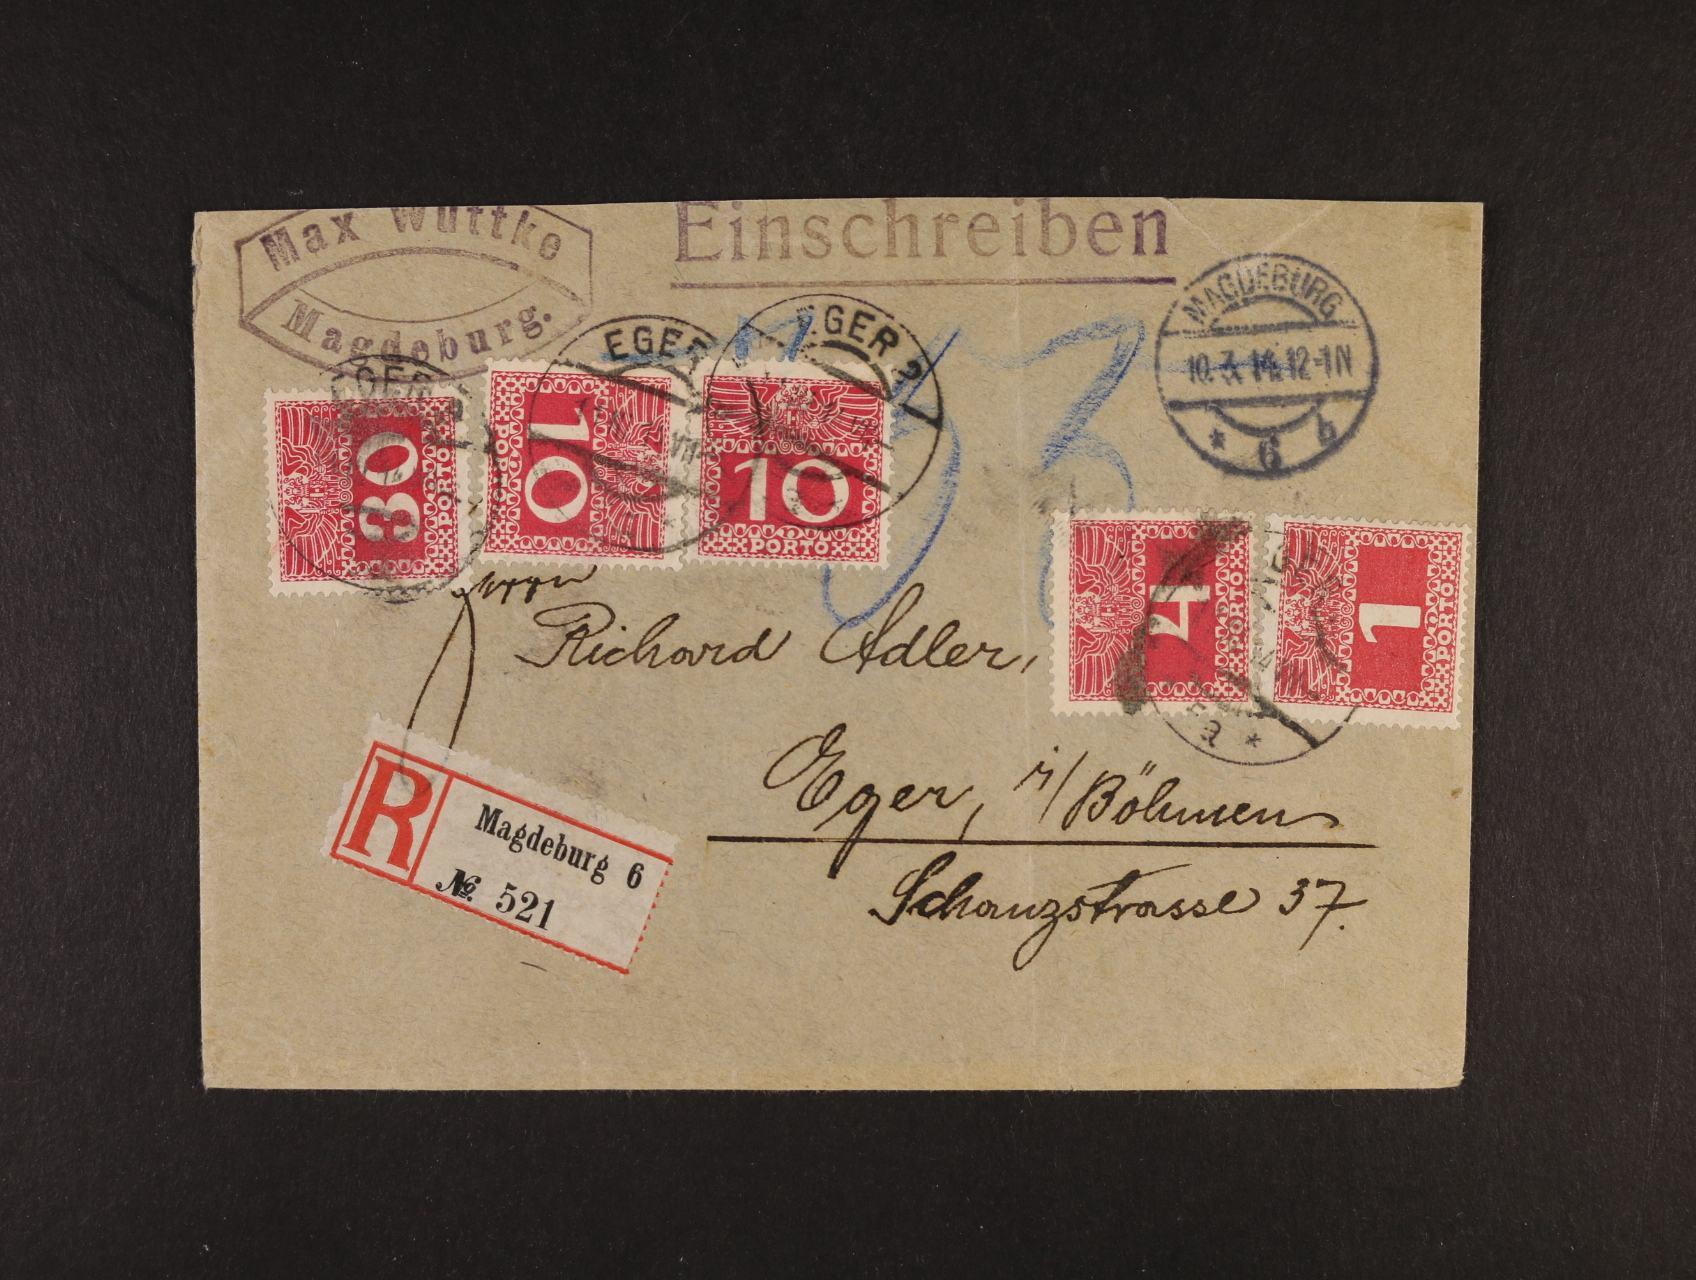 R-dopis zaslaný nevyplaceně do Chebu, pod. raz. MAGDEBURG 10.3.1914, v Chebu zatíž. tr. portem 55h s raz. EGER 113.14, zajímavé